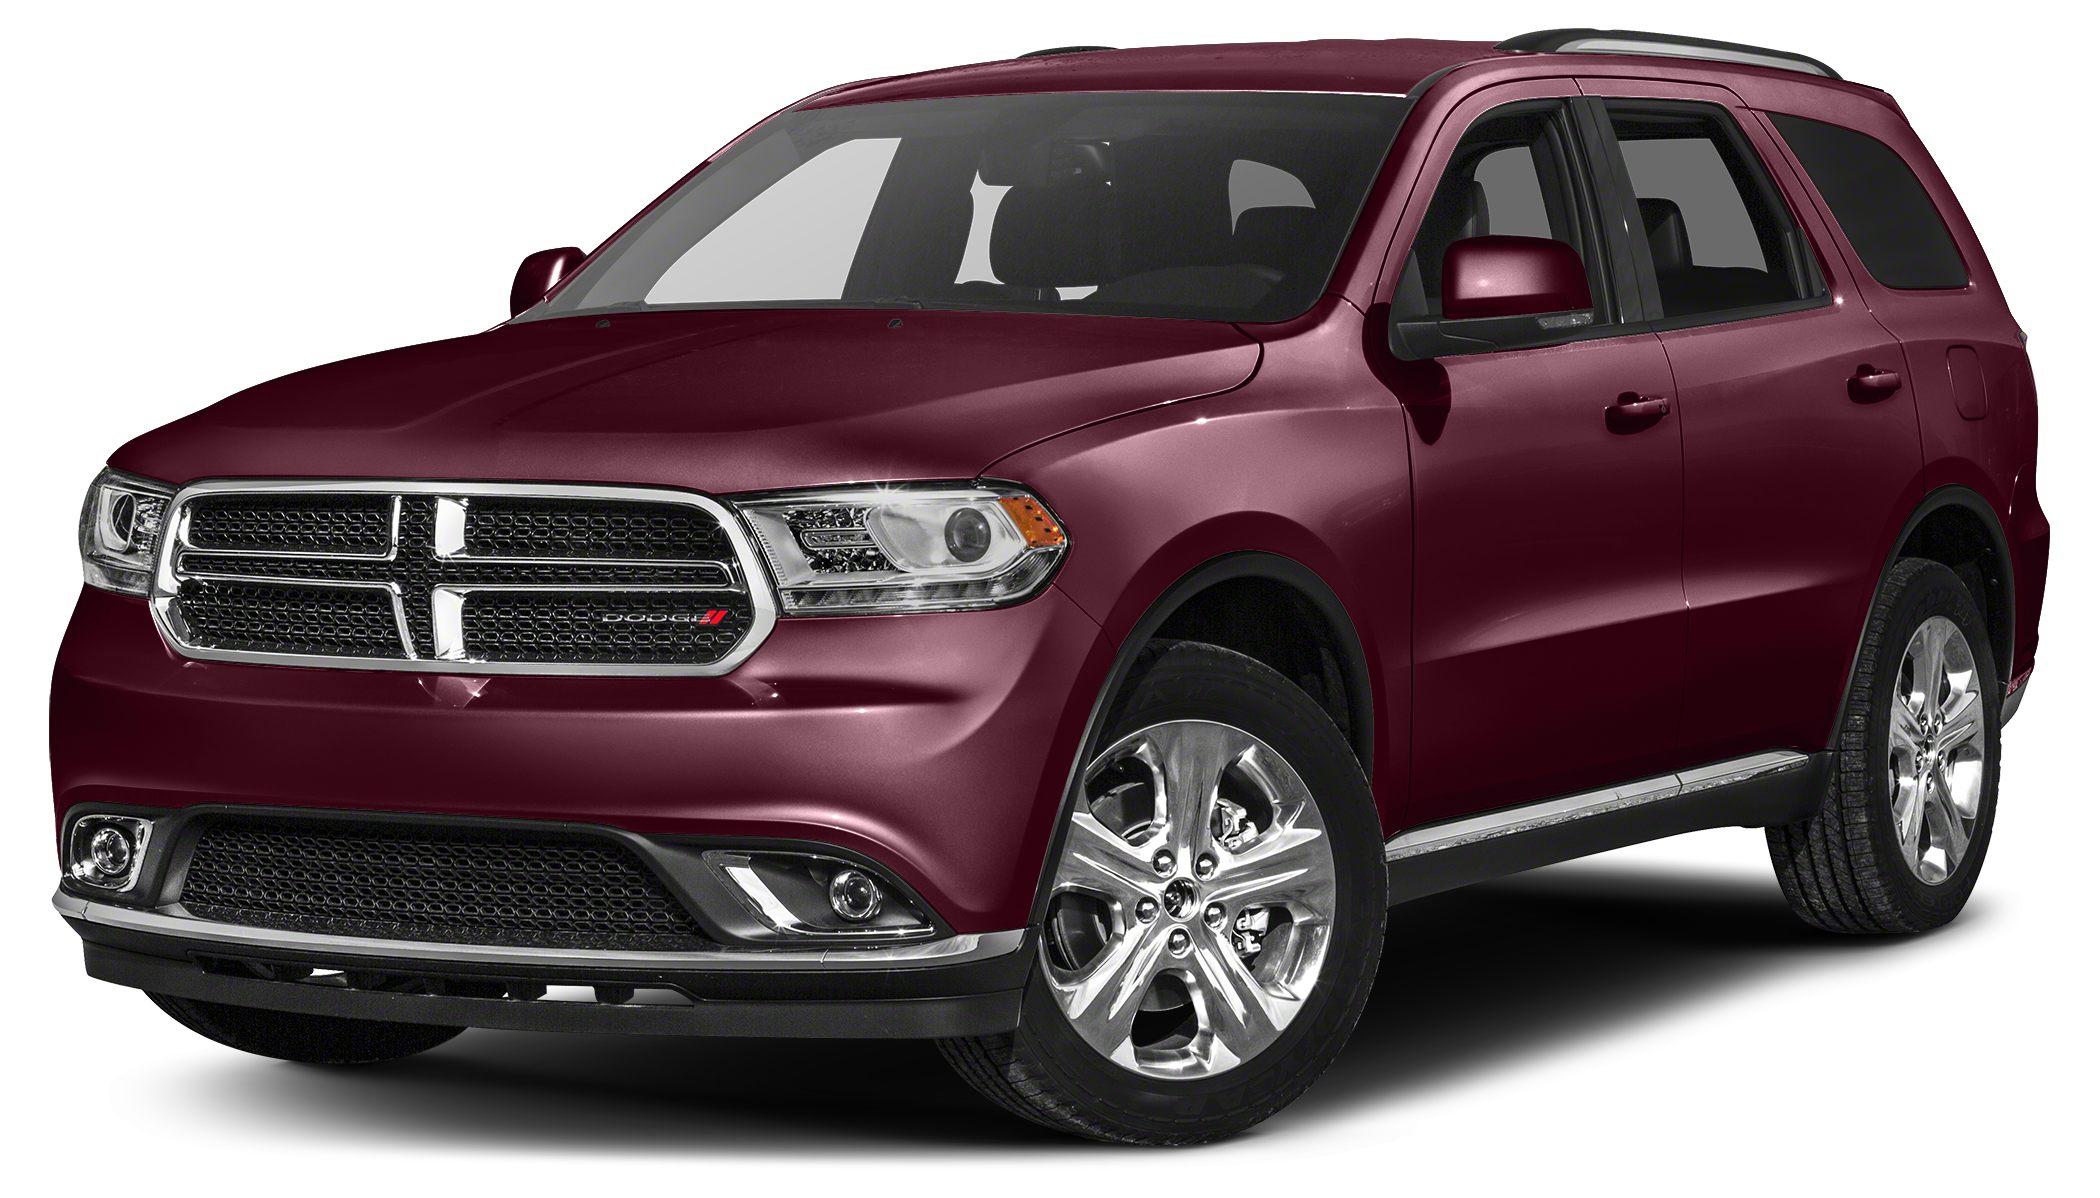 2016 Dodge Durango Limited Miles 0Color Dark Garnet Red Pearlcoat Stock DT3545 VIN 1C4RDHDG9